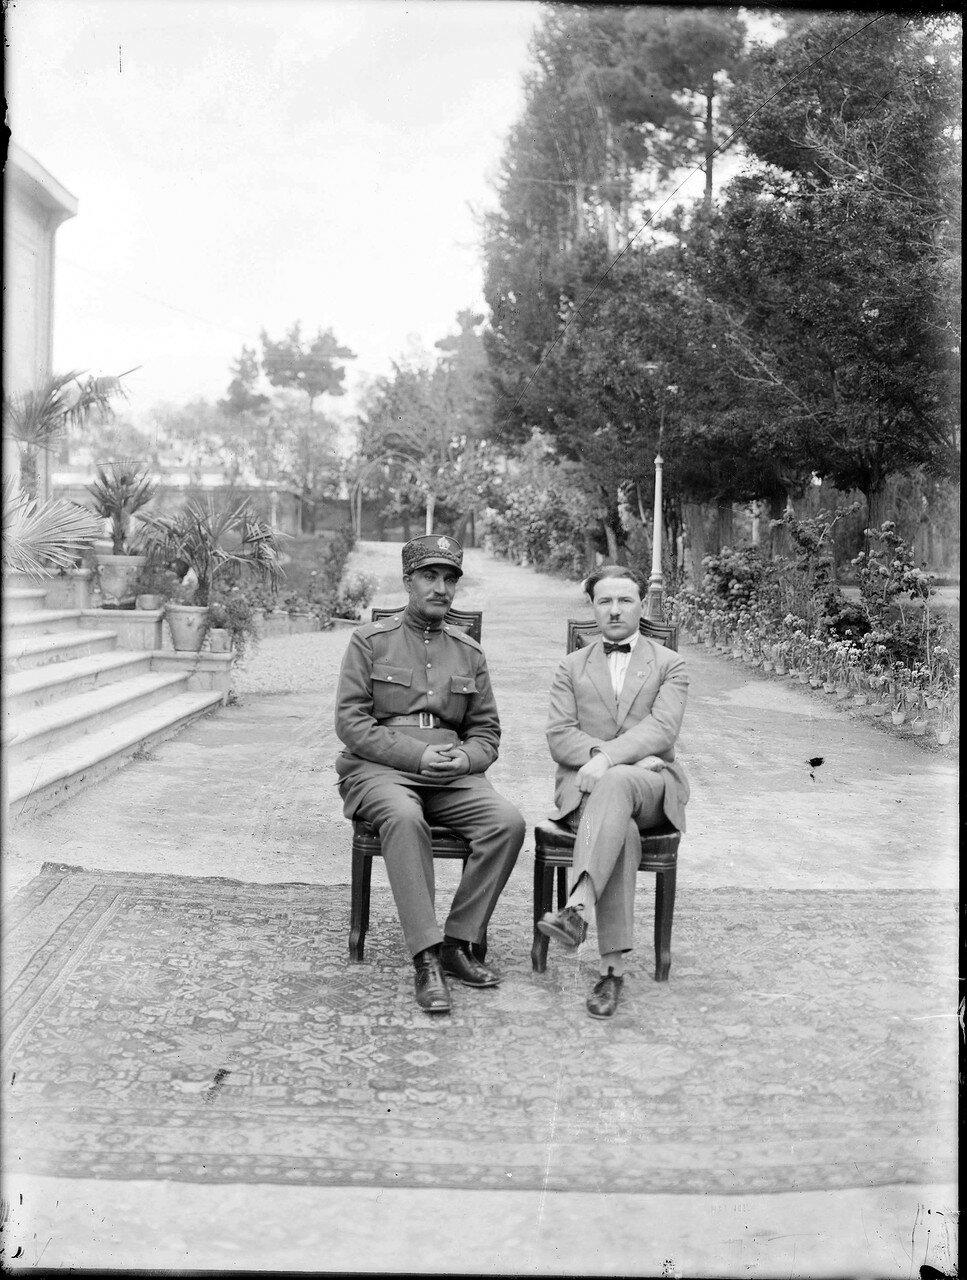 Шах Реза Пехлеви с Борисом Захаровием Шумяцким, полномочным представителем Советского Союза. 1925